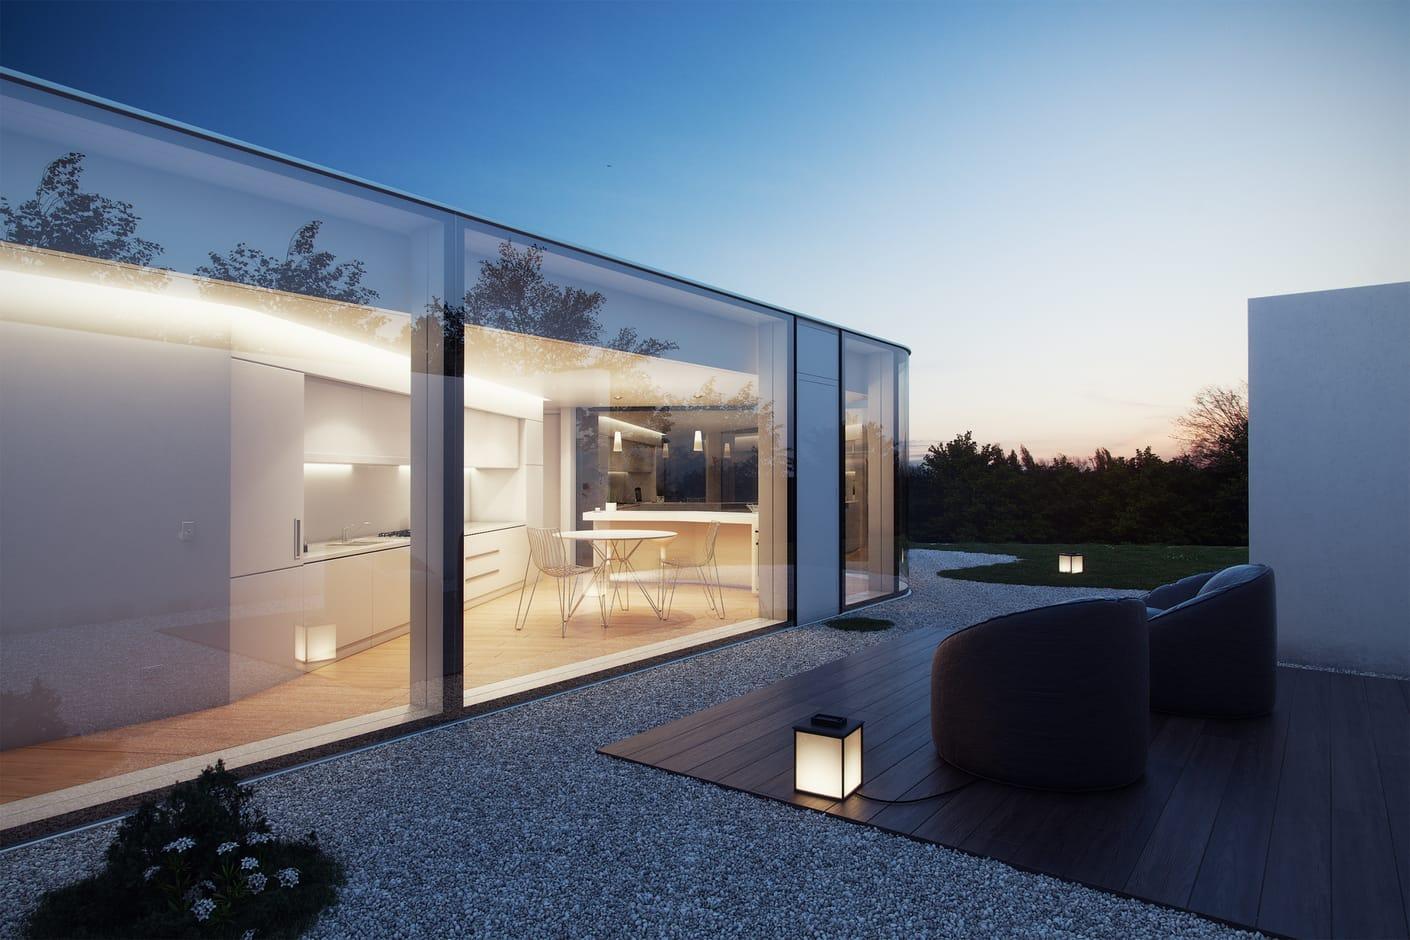 Lake lugano house david santos chaos group for Architecture minimale